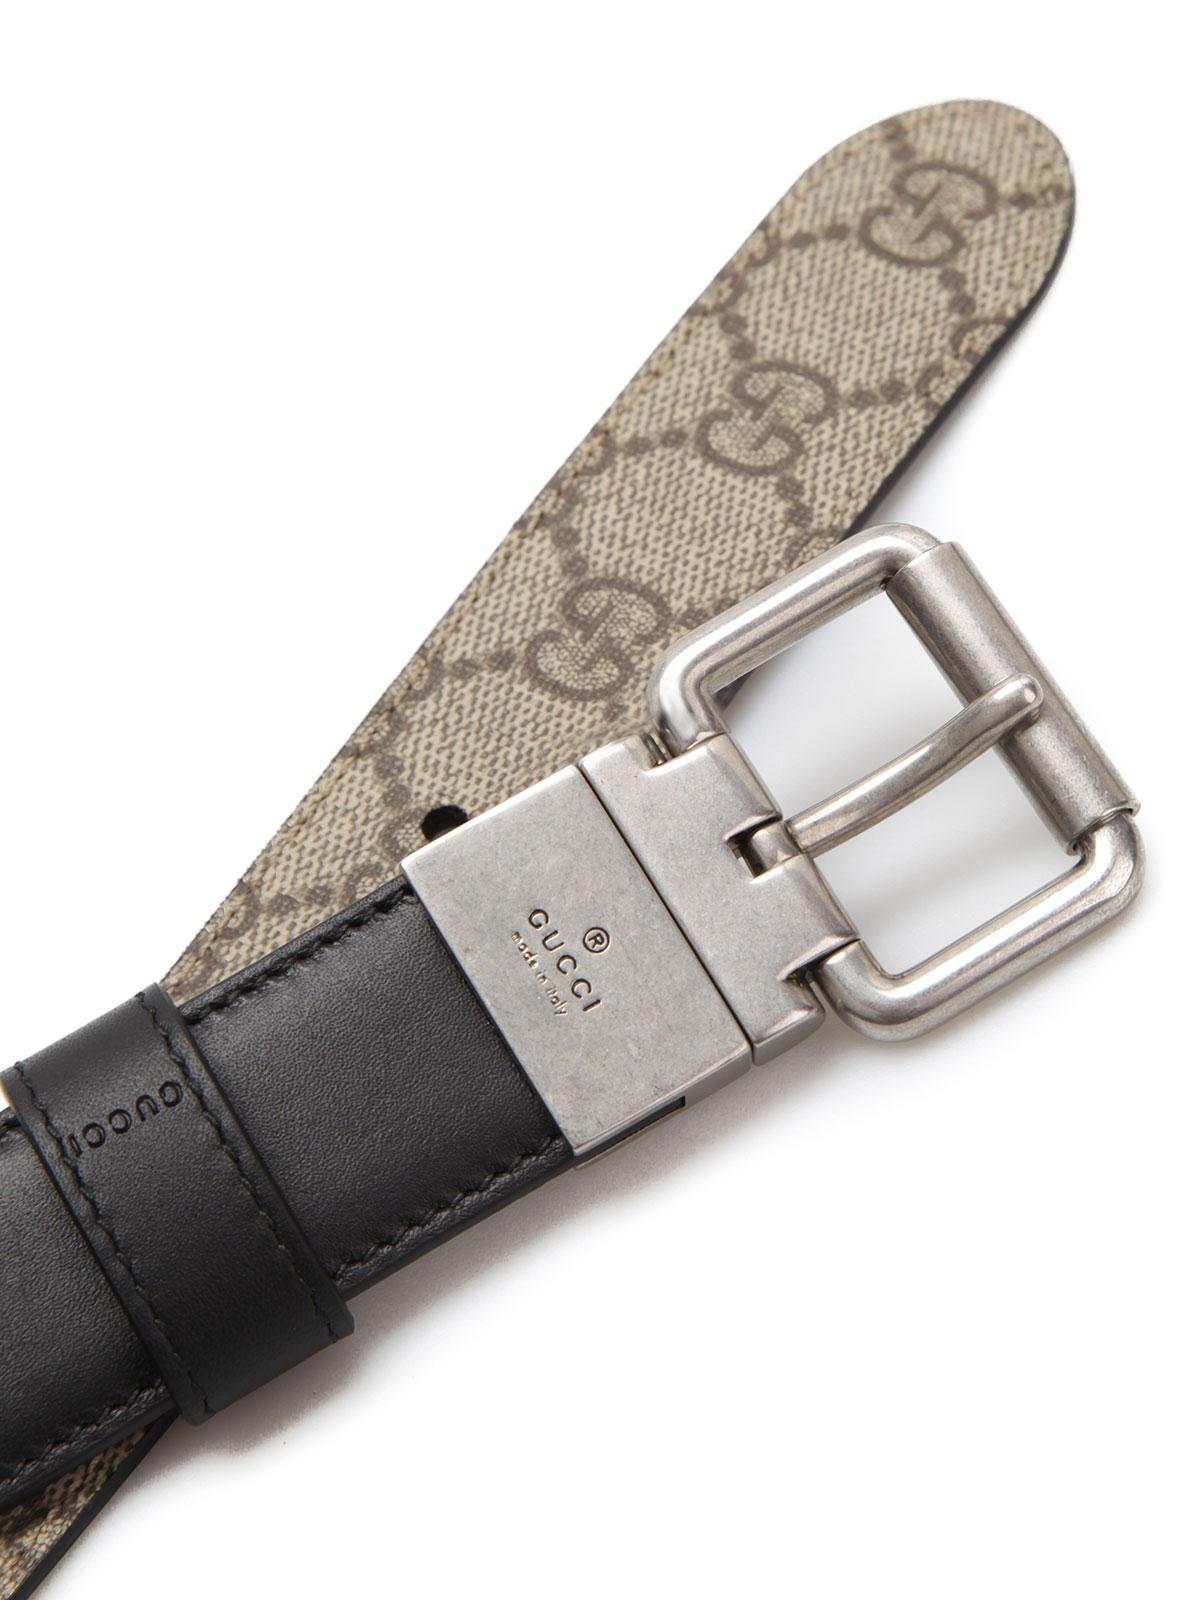 199bf901a Gucci - Reversible GG Supreme belt - belts - 387035 BTTAN 8775 ...